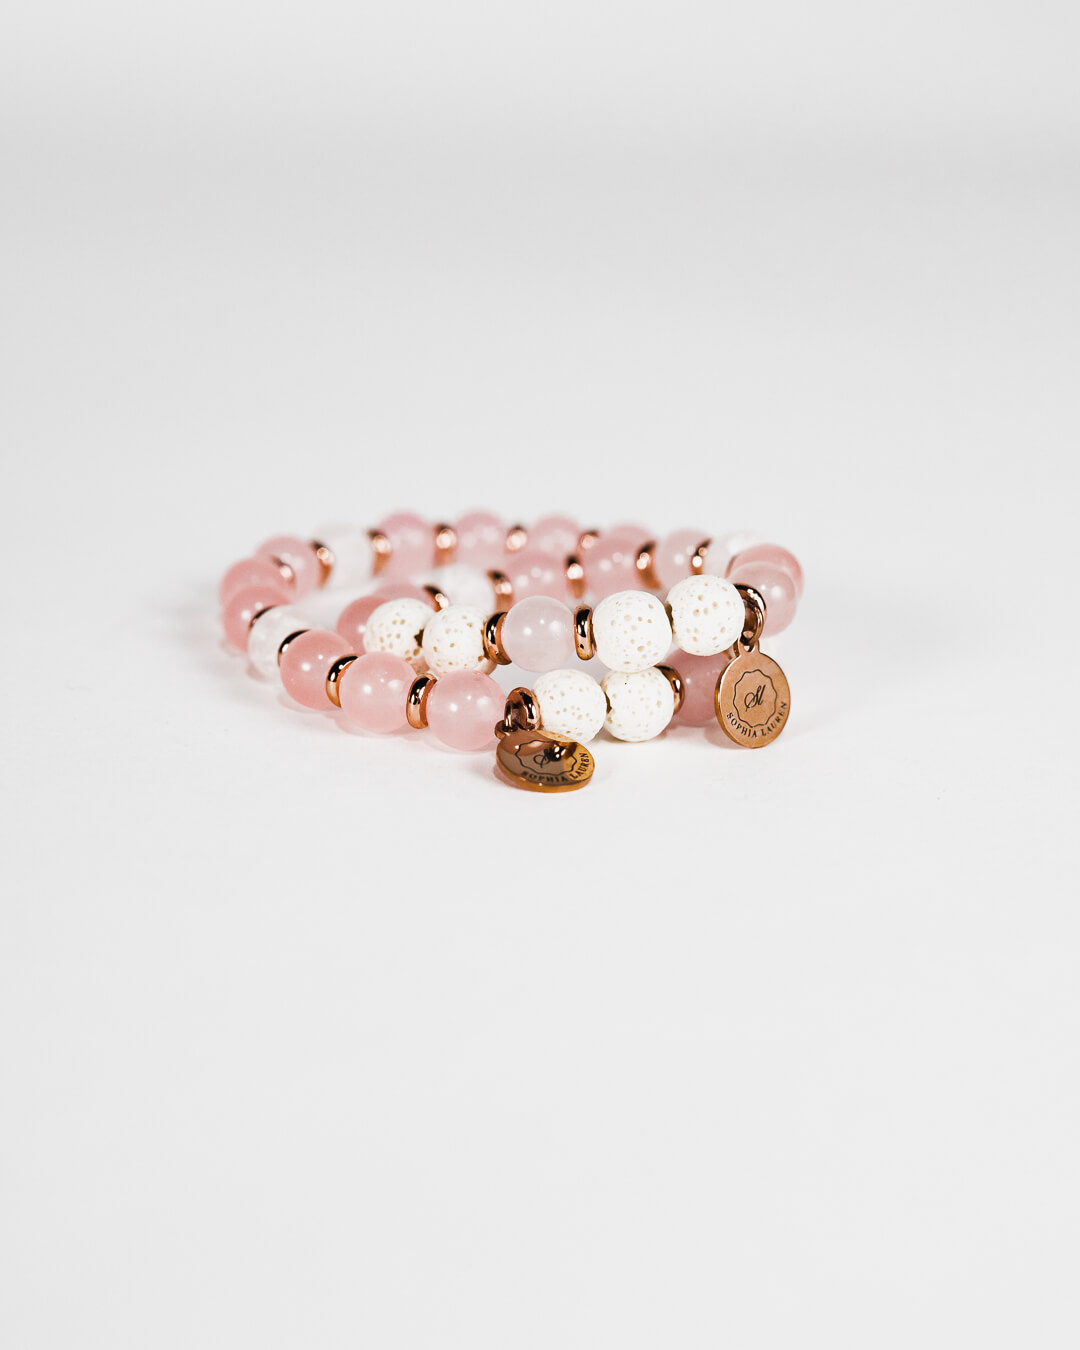 essential oil bracelet